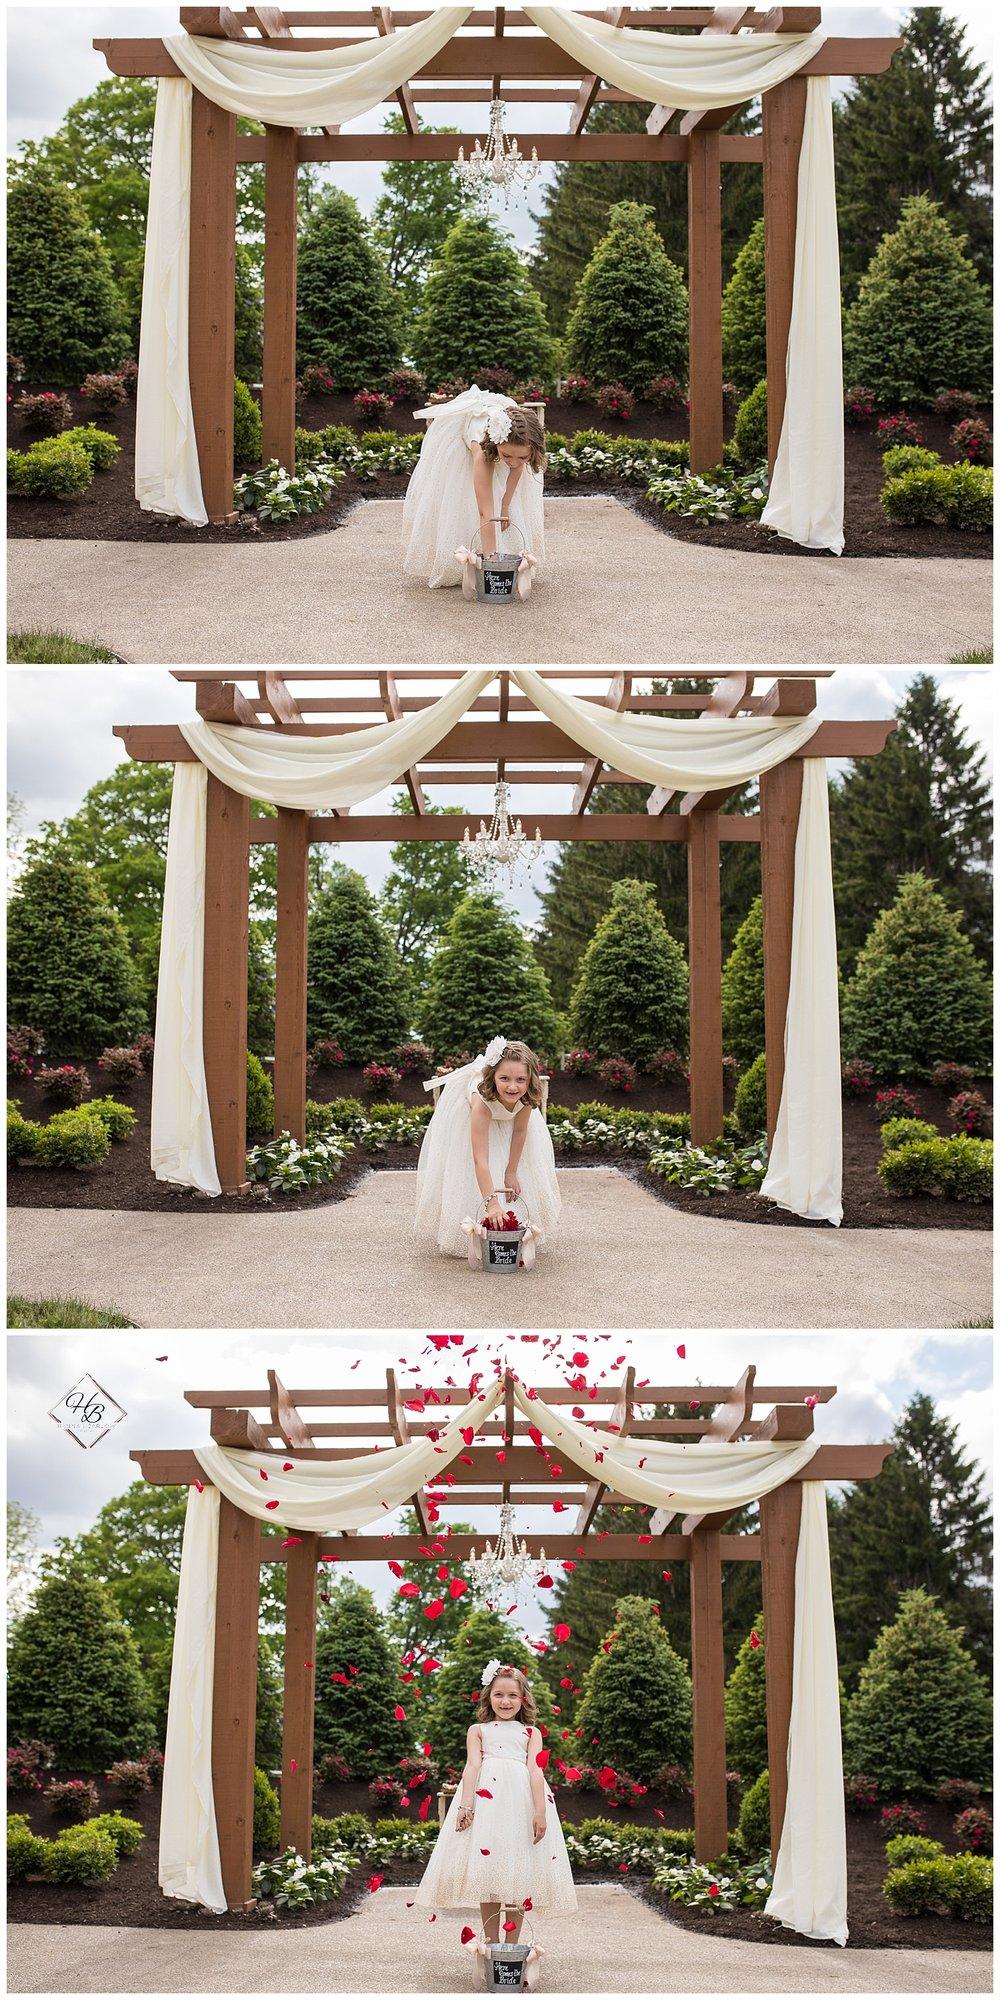 Irons Mills Vintage Wedding Flower Girl Throwing Petals